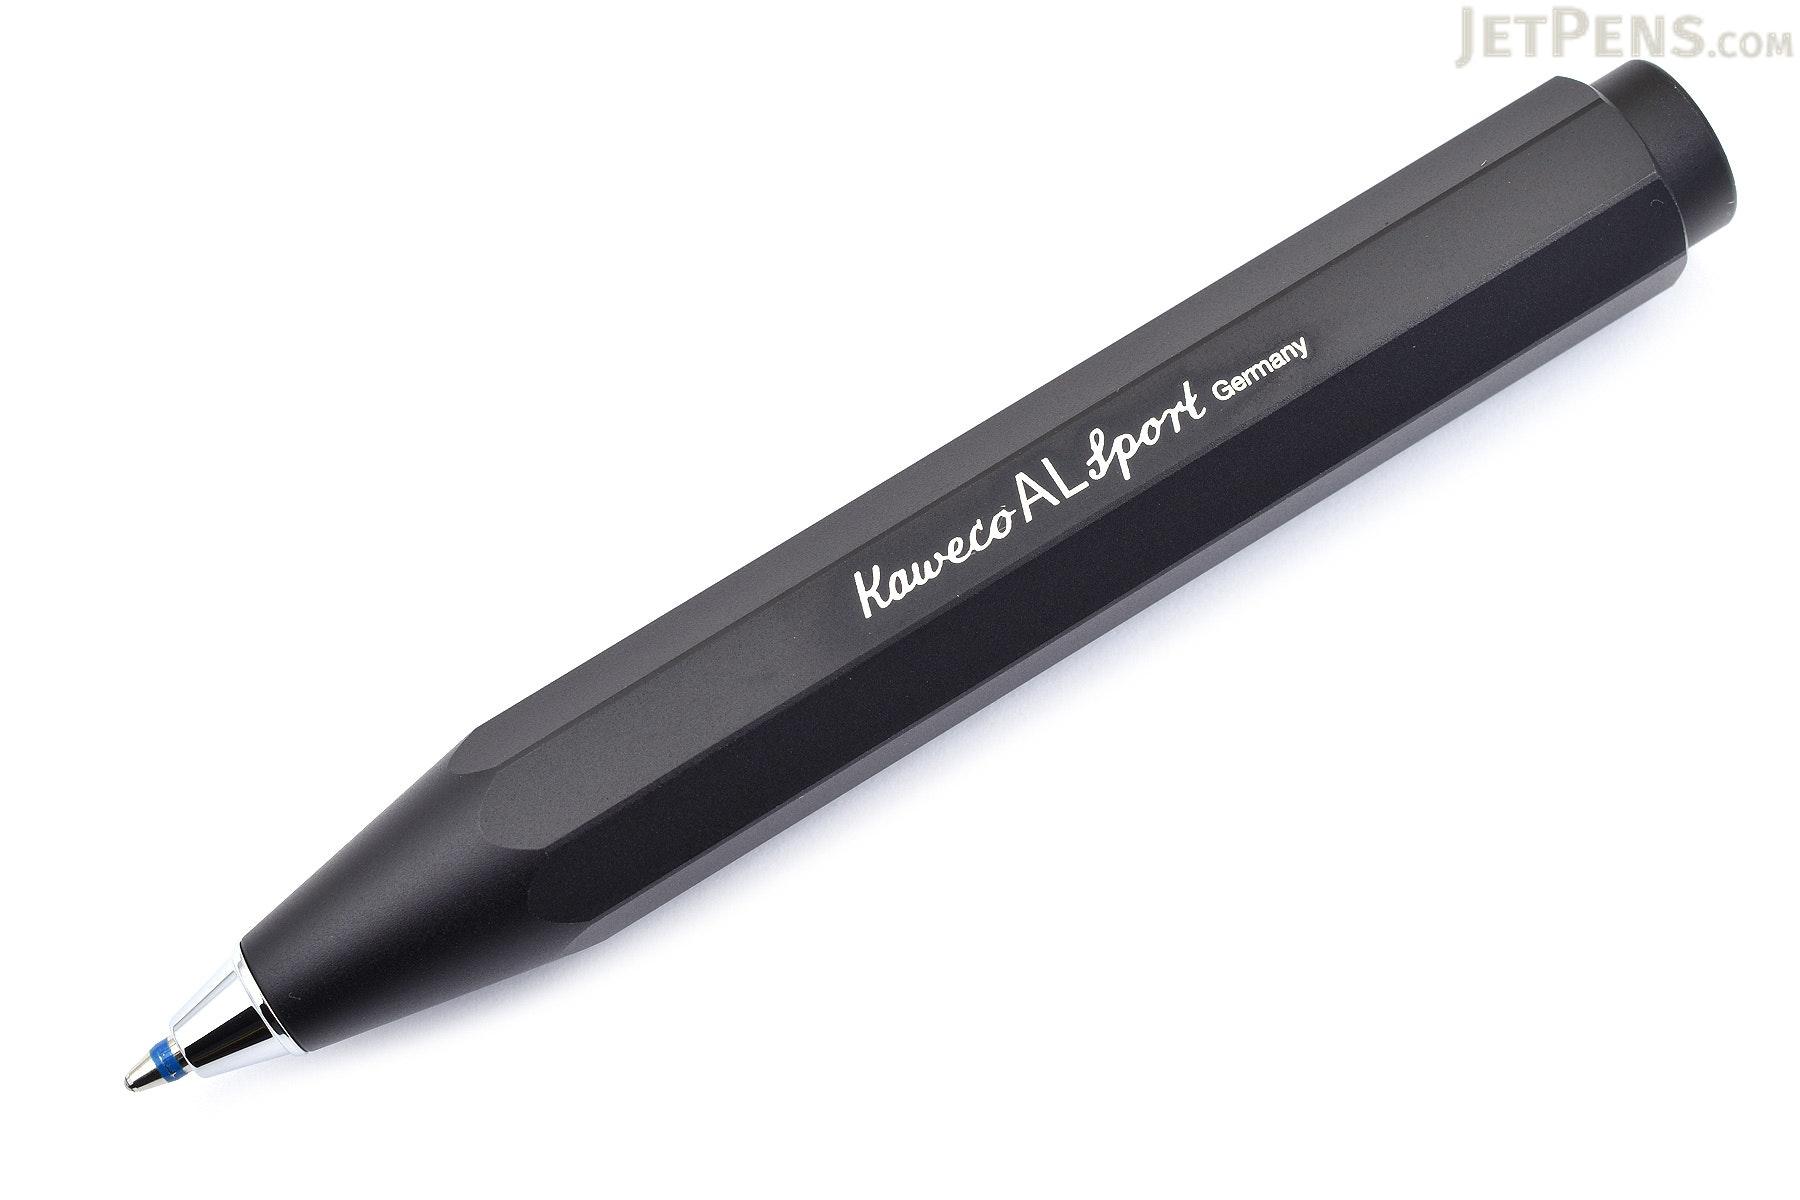 Kaweco AL Sport Ballpoint Pen - 1.0 mm - Black Body - KAWECO 10000100